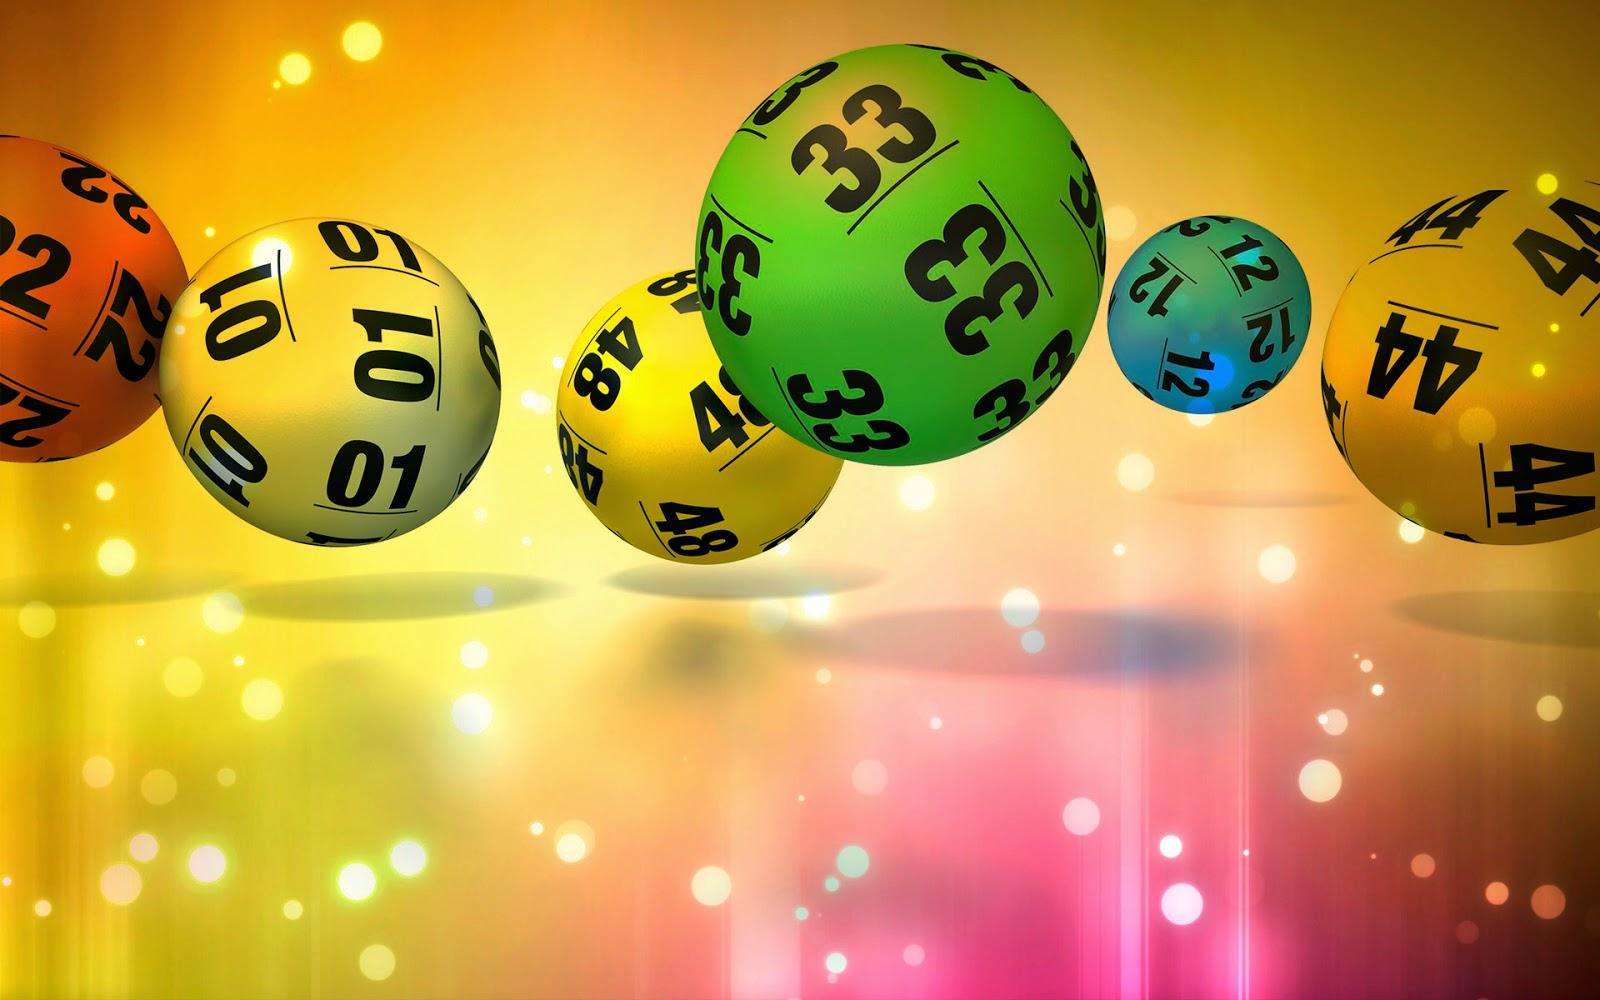 Eliminan sorteos diarios de loteria para reducir juegos de azar en ...